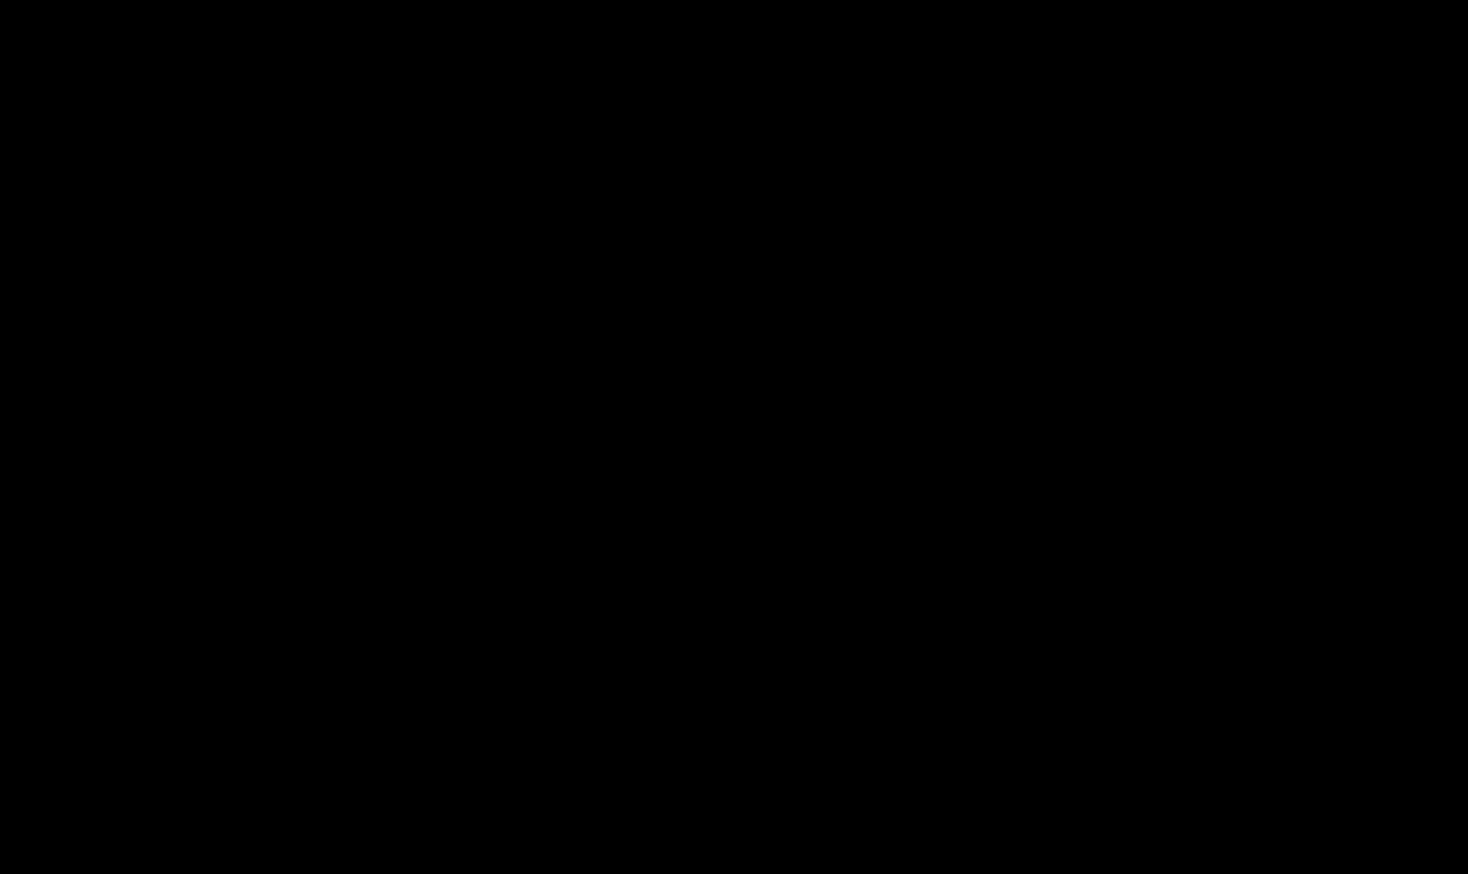 DBCO-dPEG®₁₂-MAL